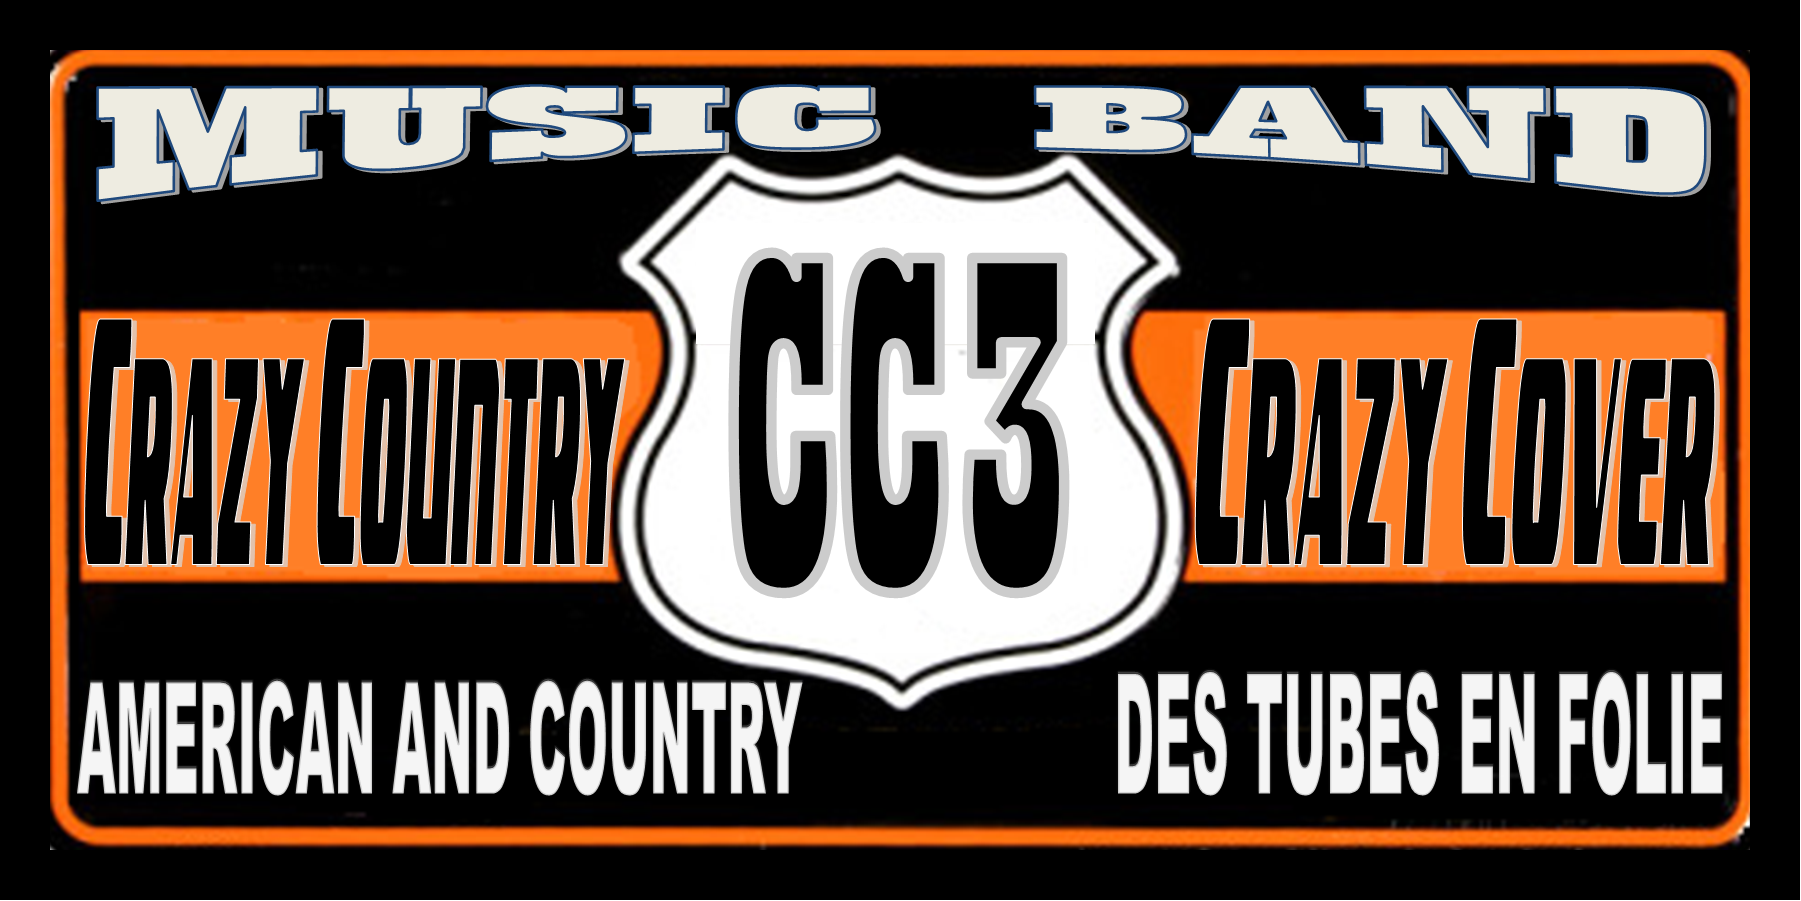 Si cc3 new logo 2021 3